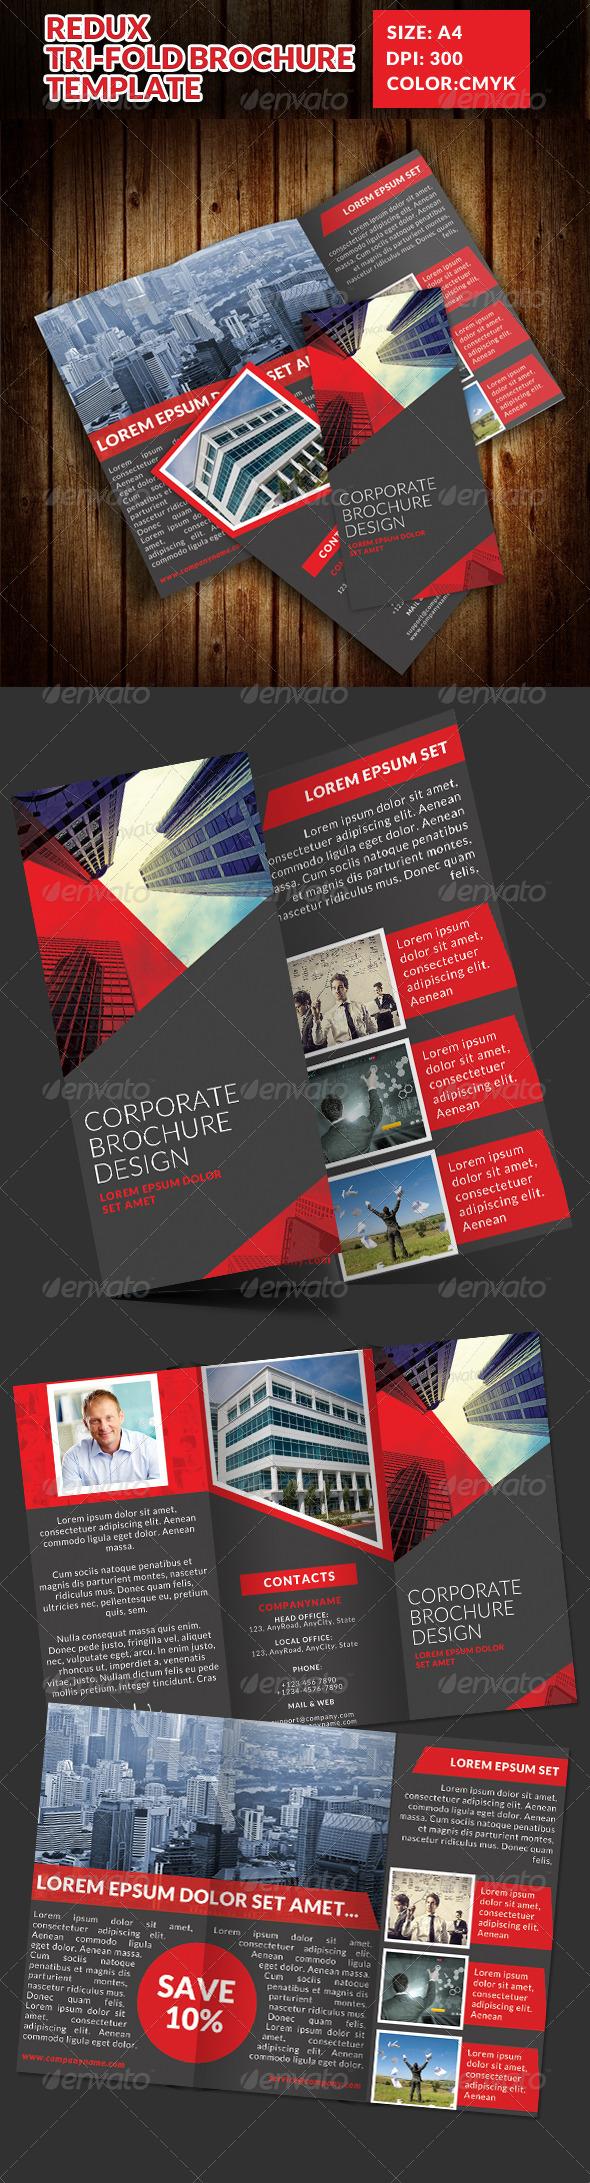 Redux Corporate Tri-Fold Brochure Template